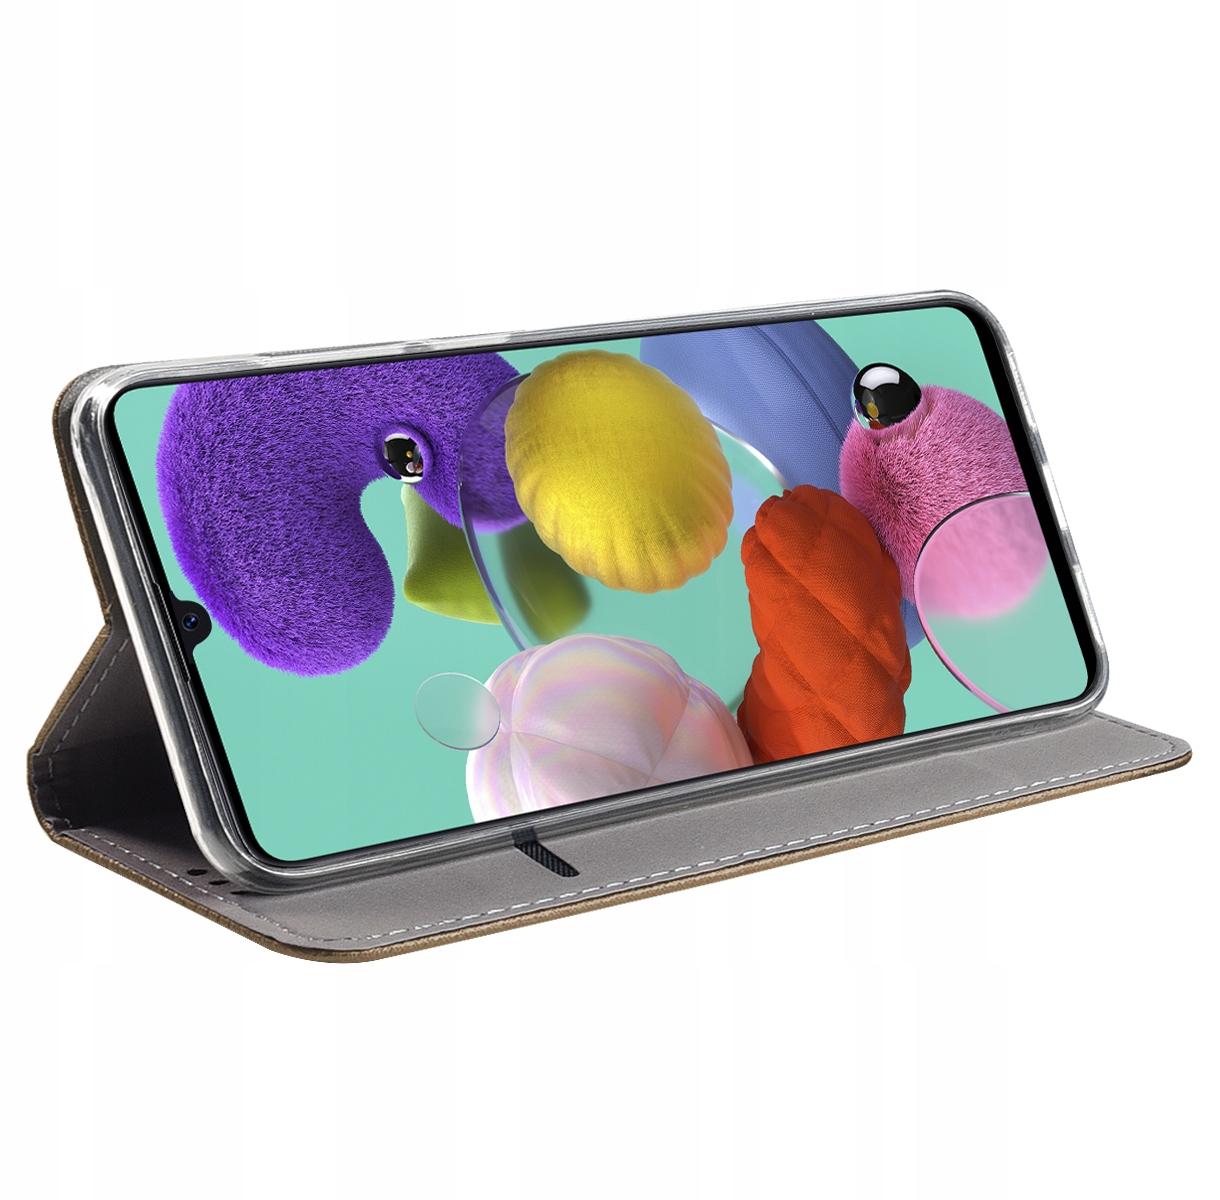 Etui do Samsung Galaxy A42 5G Case Magnet + Szkło Kod producenta A216A E78B